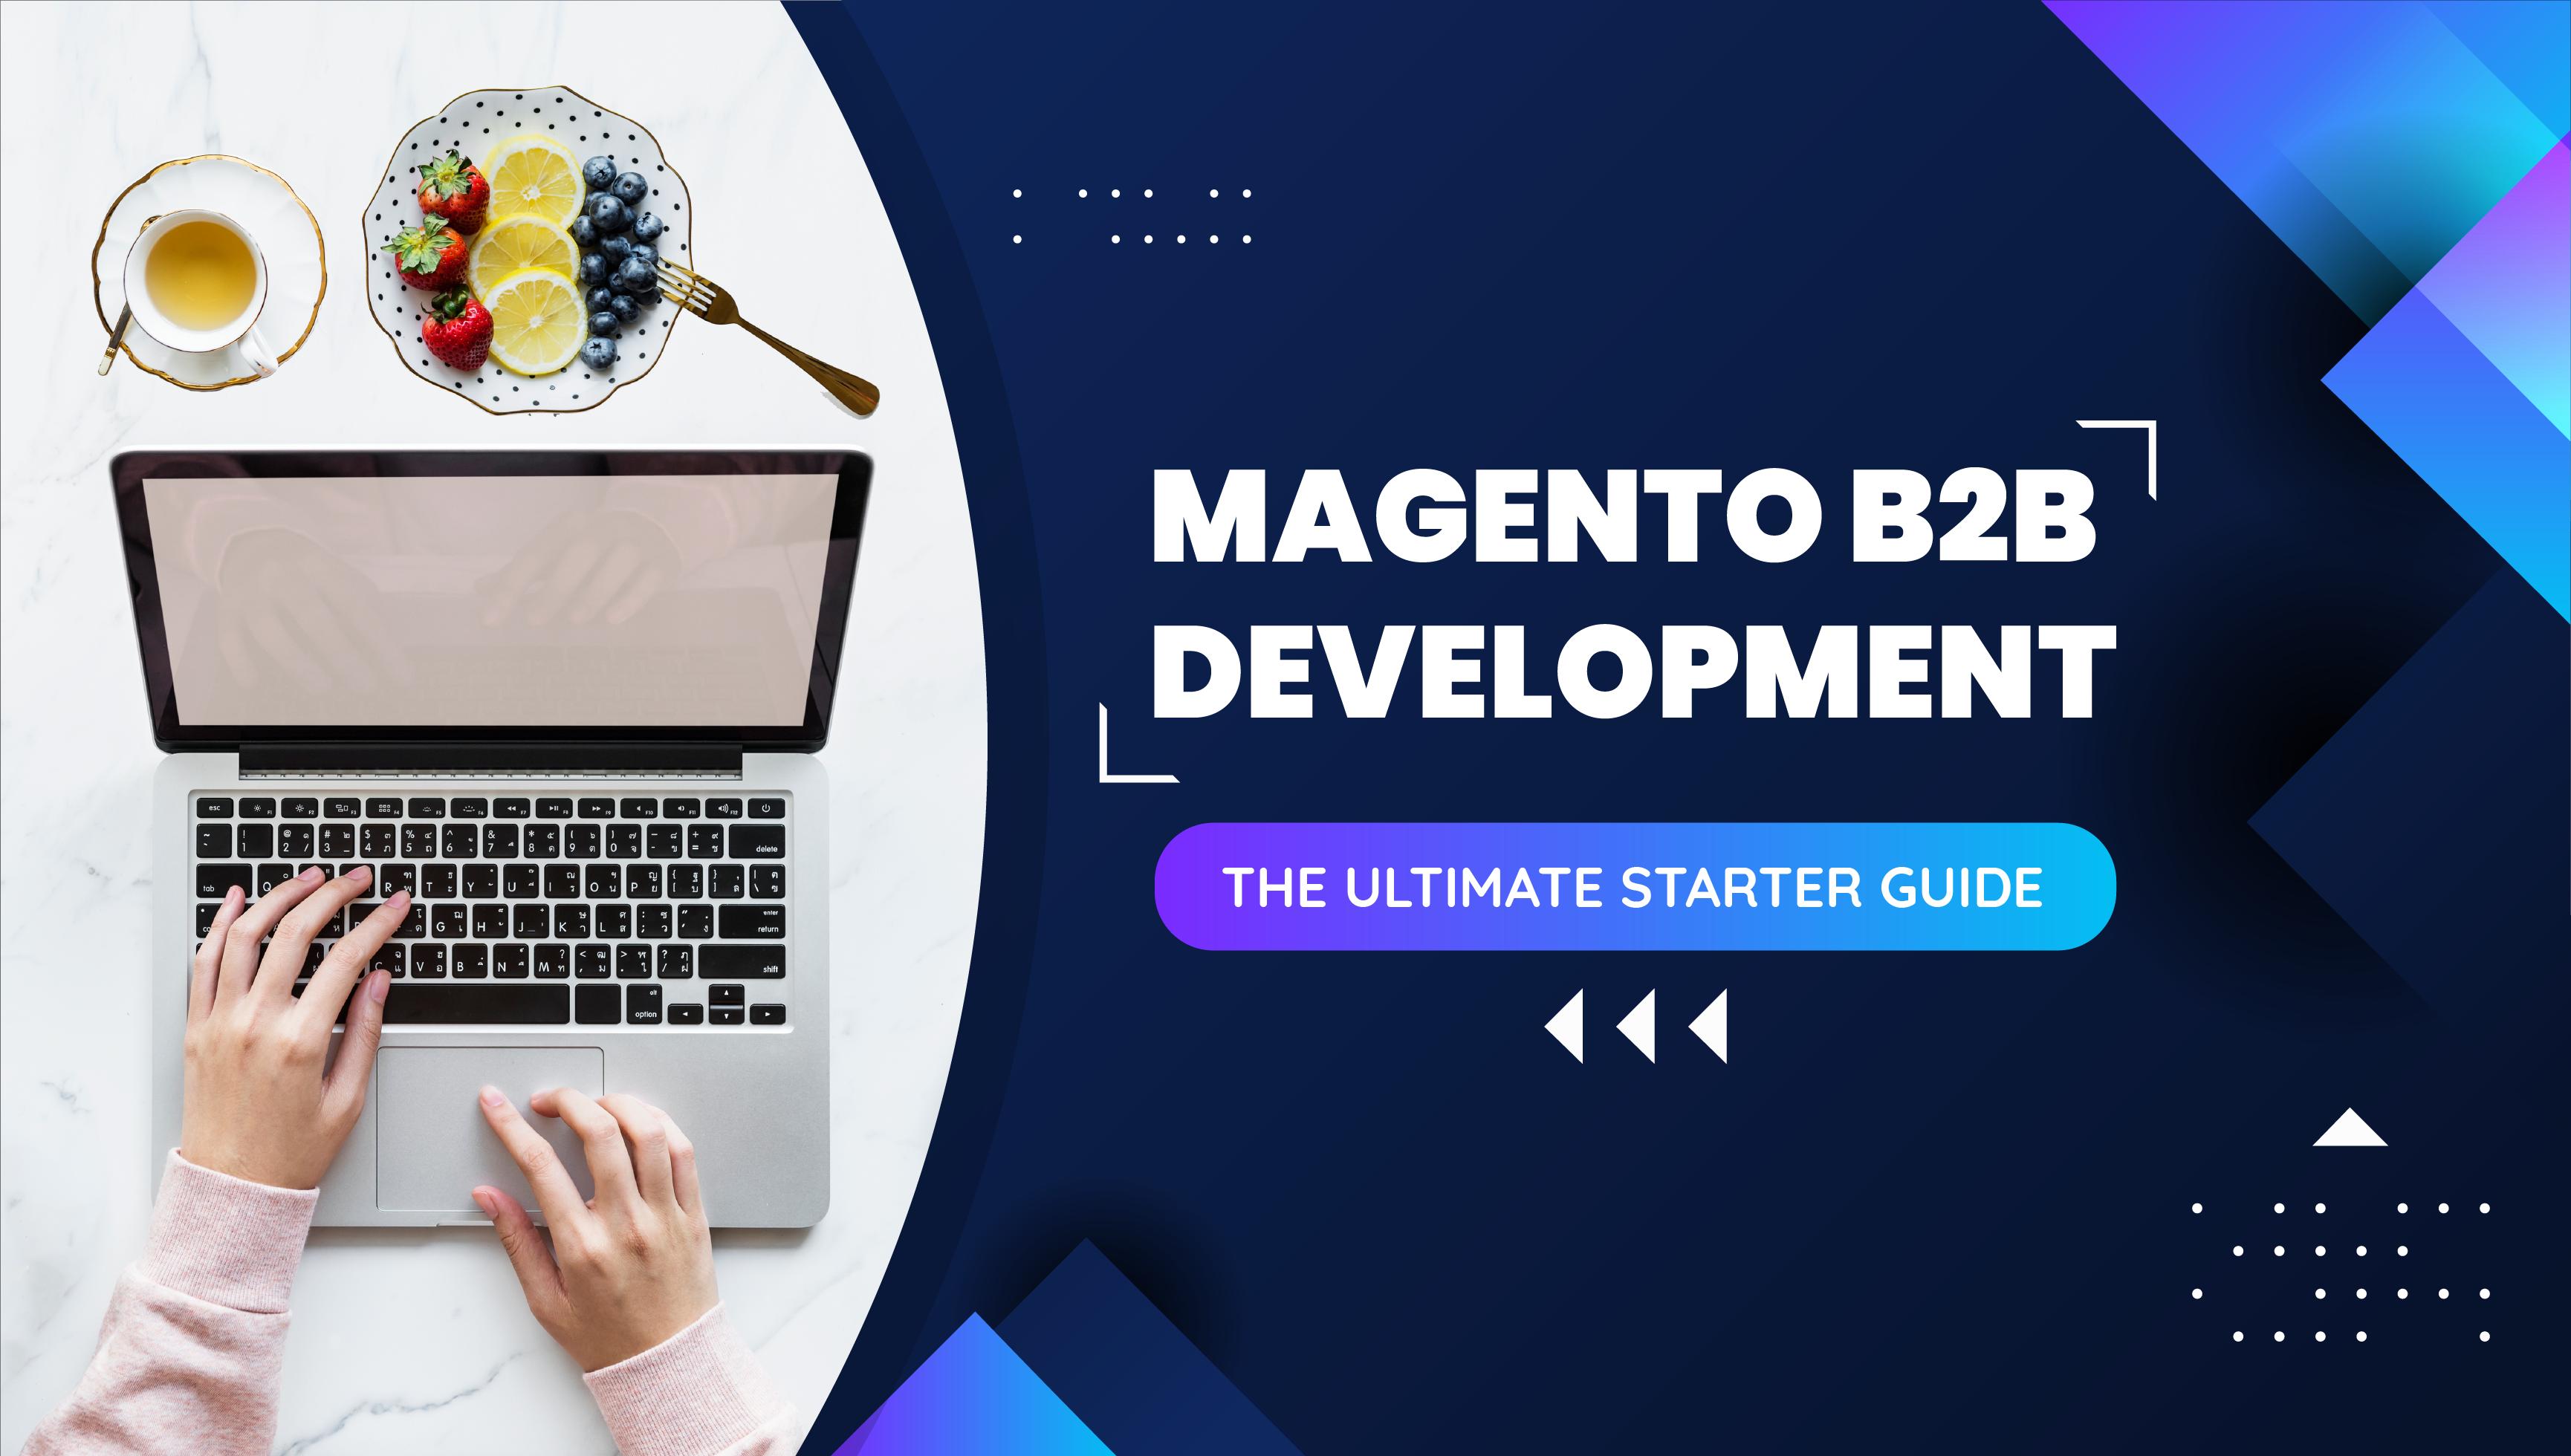 magento-b2b-development